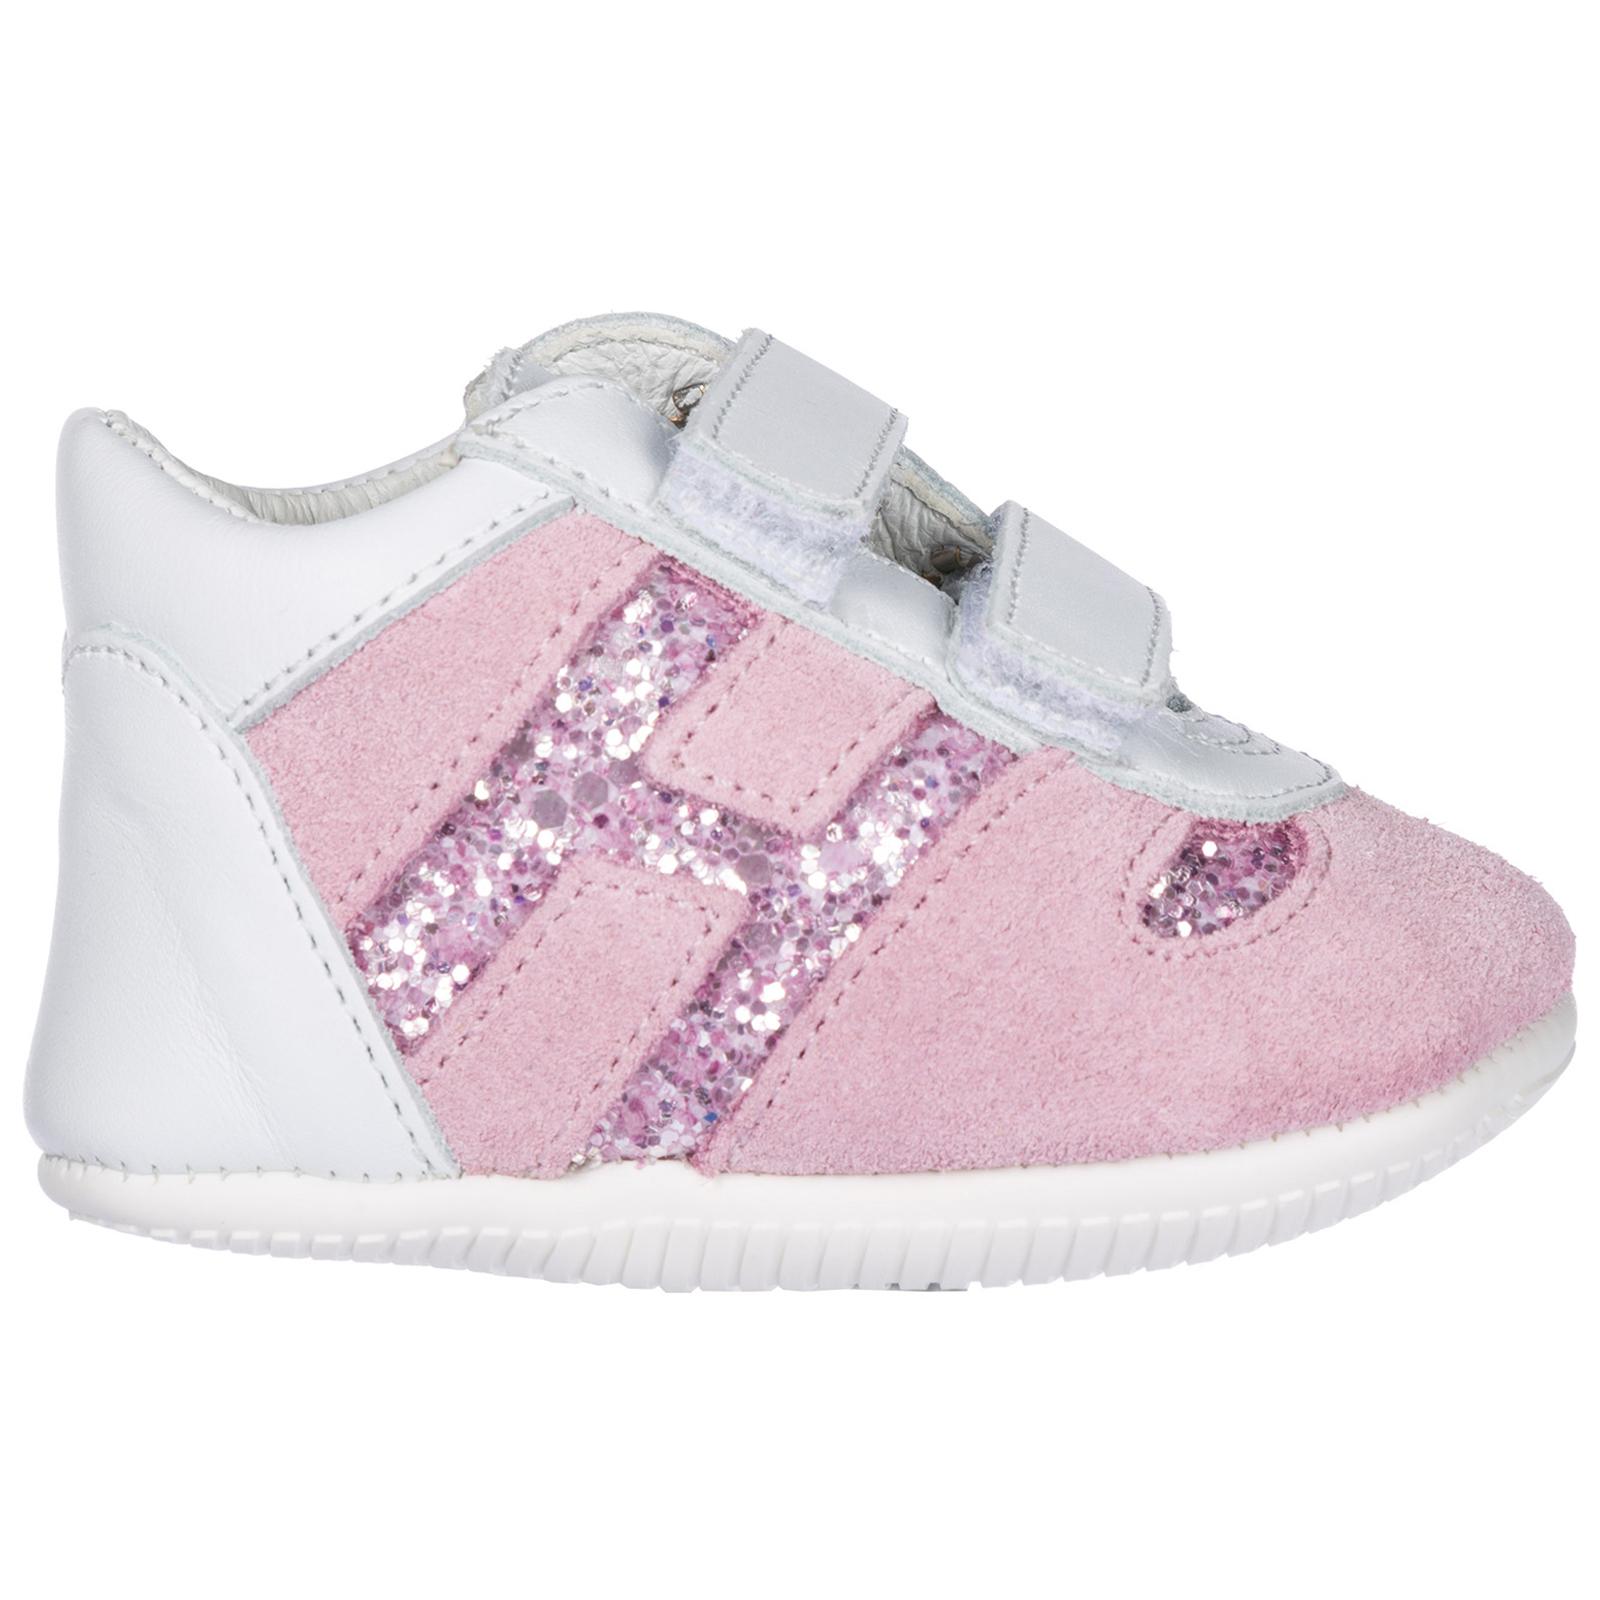 78.40€. hogan scarpe sneakers bimba bambina ... 93a4e34c150